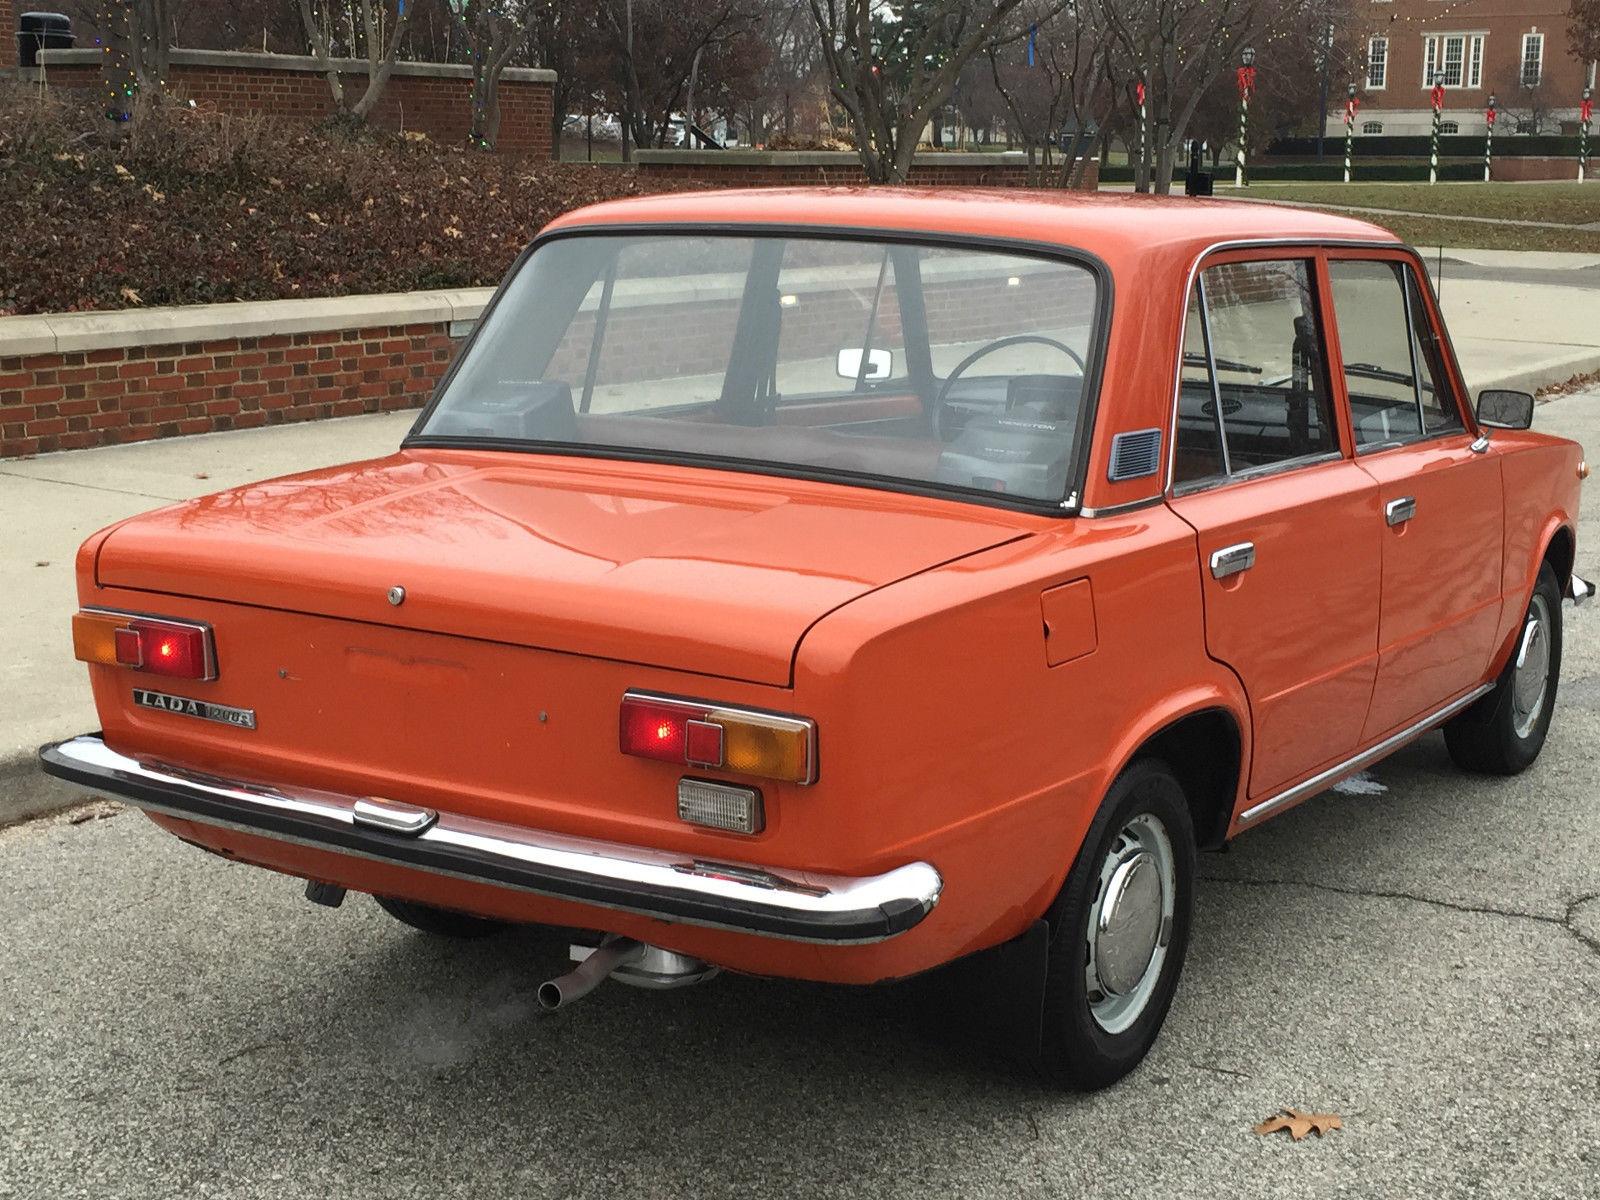 Lada vaz 2101 russian soviet car in indiana very rare